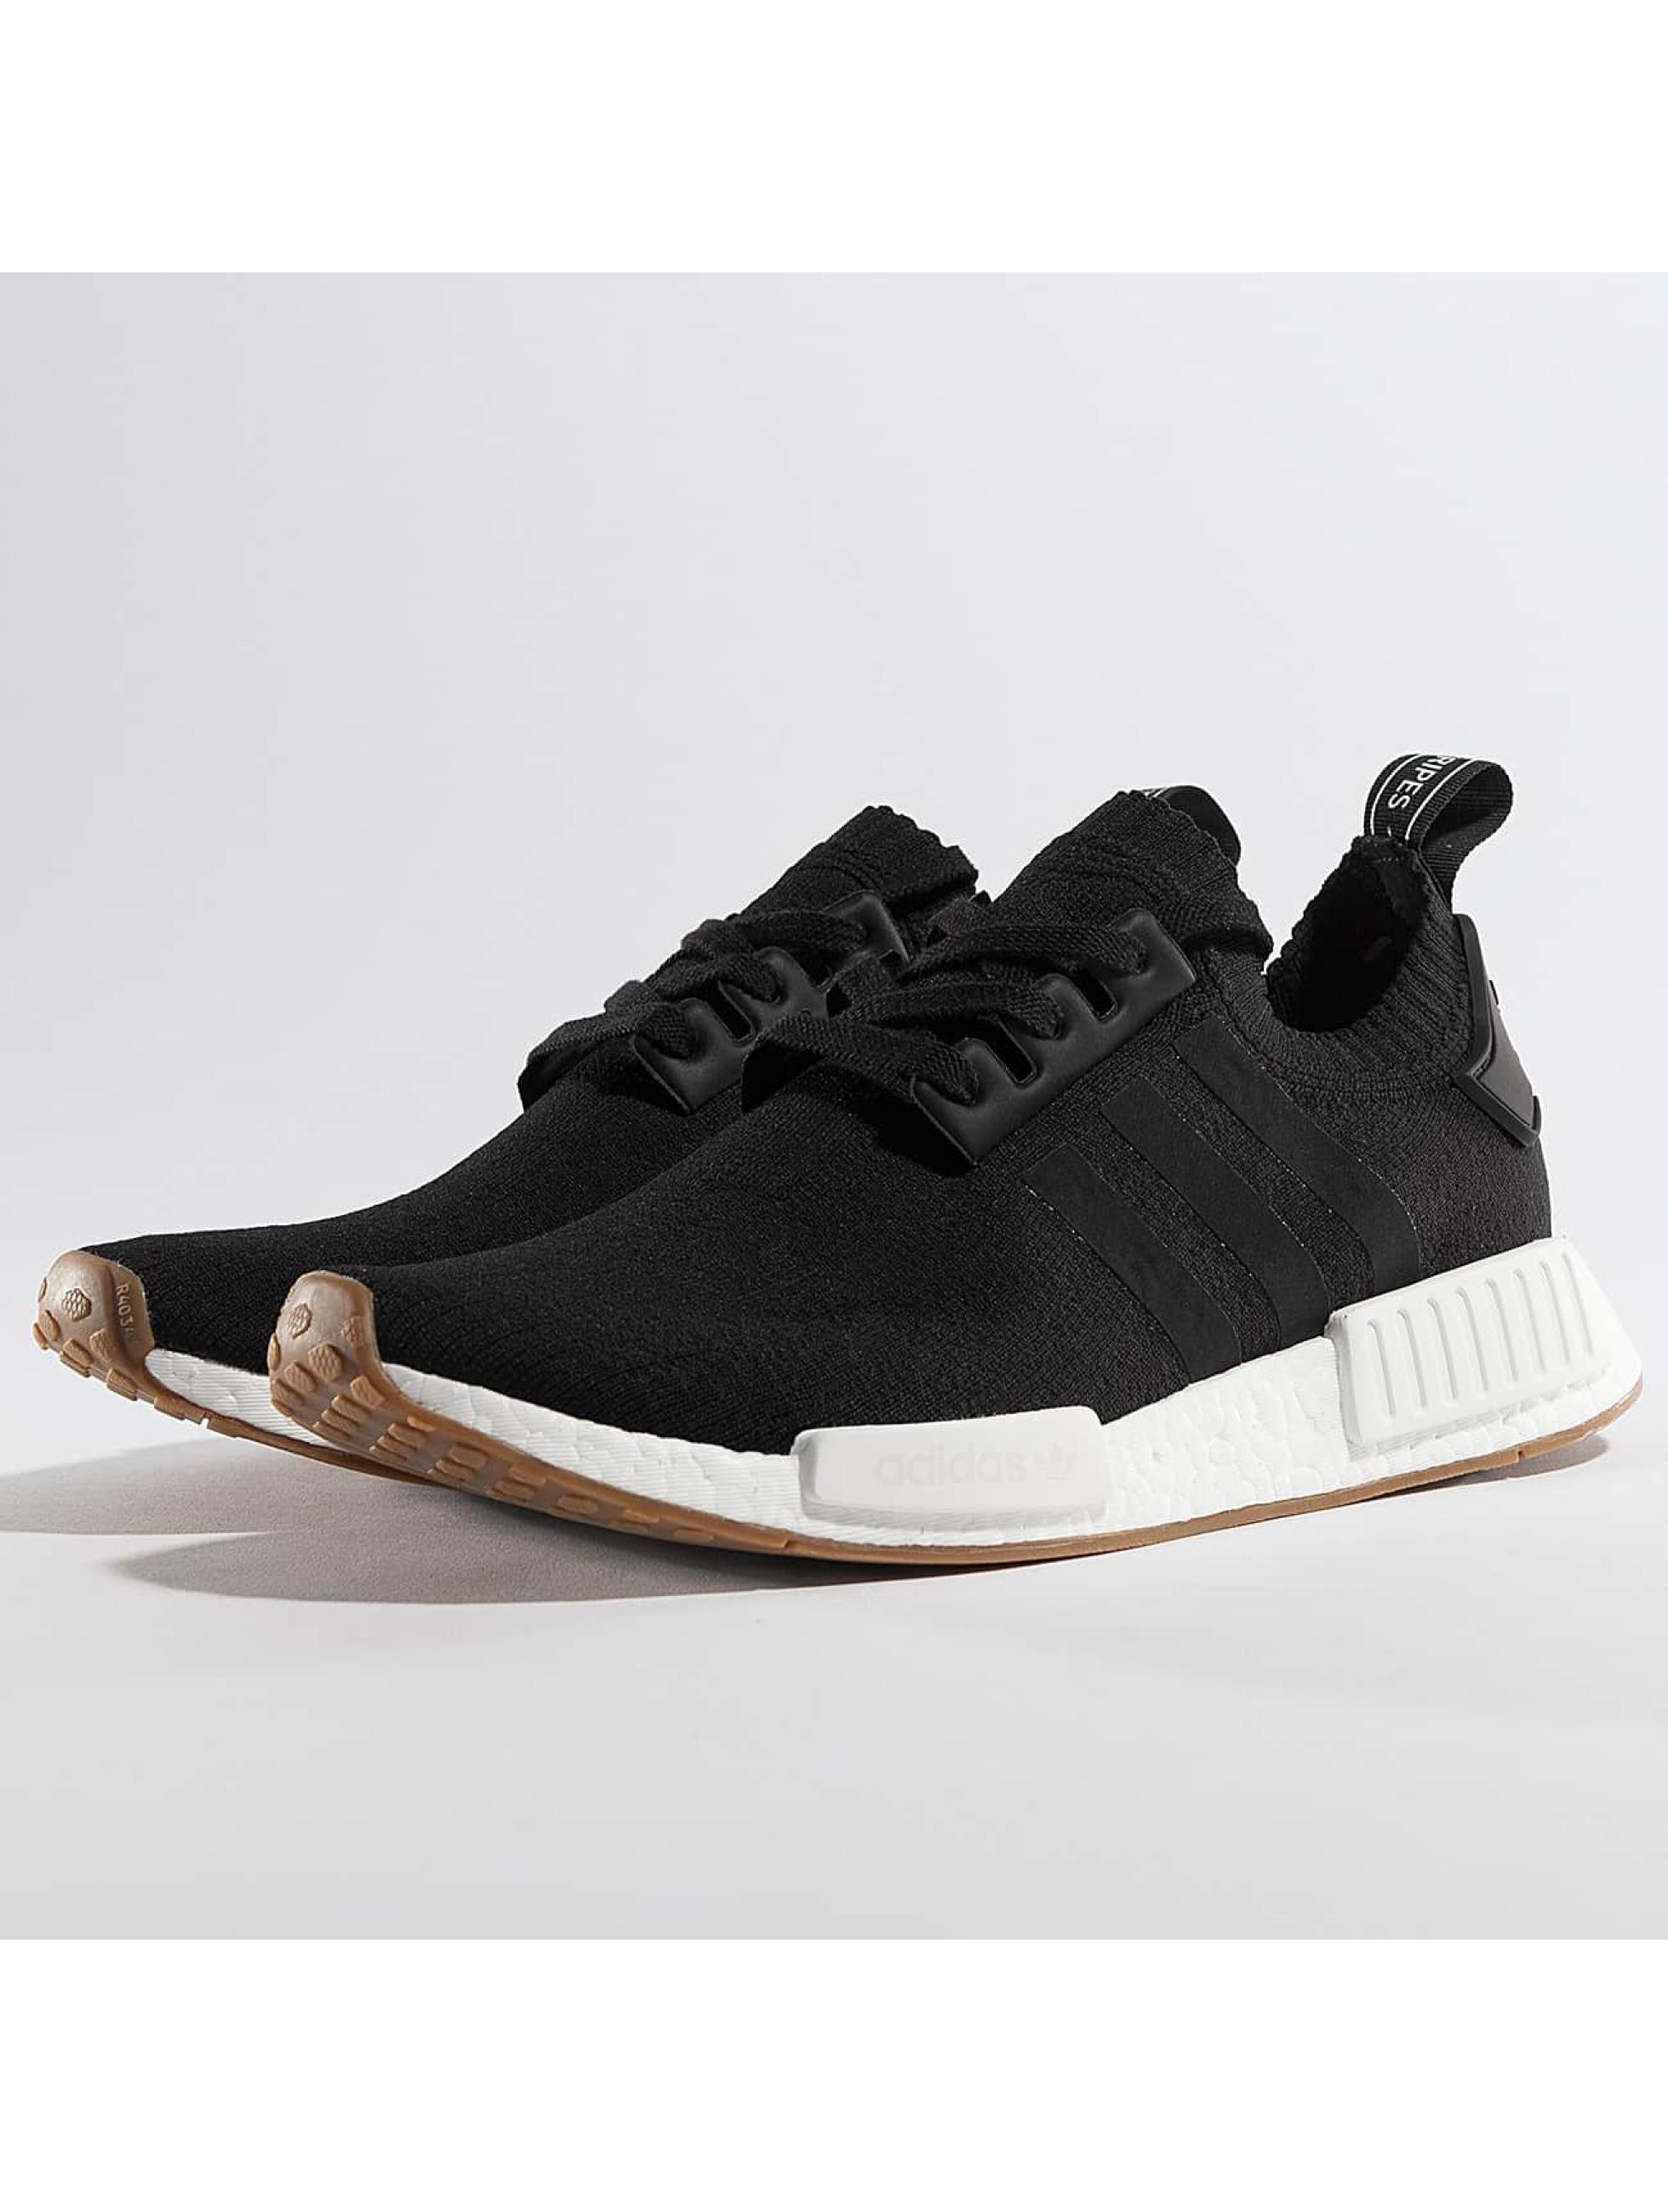 Sneaker NMD R1 PK Sneakers in schwarz